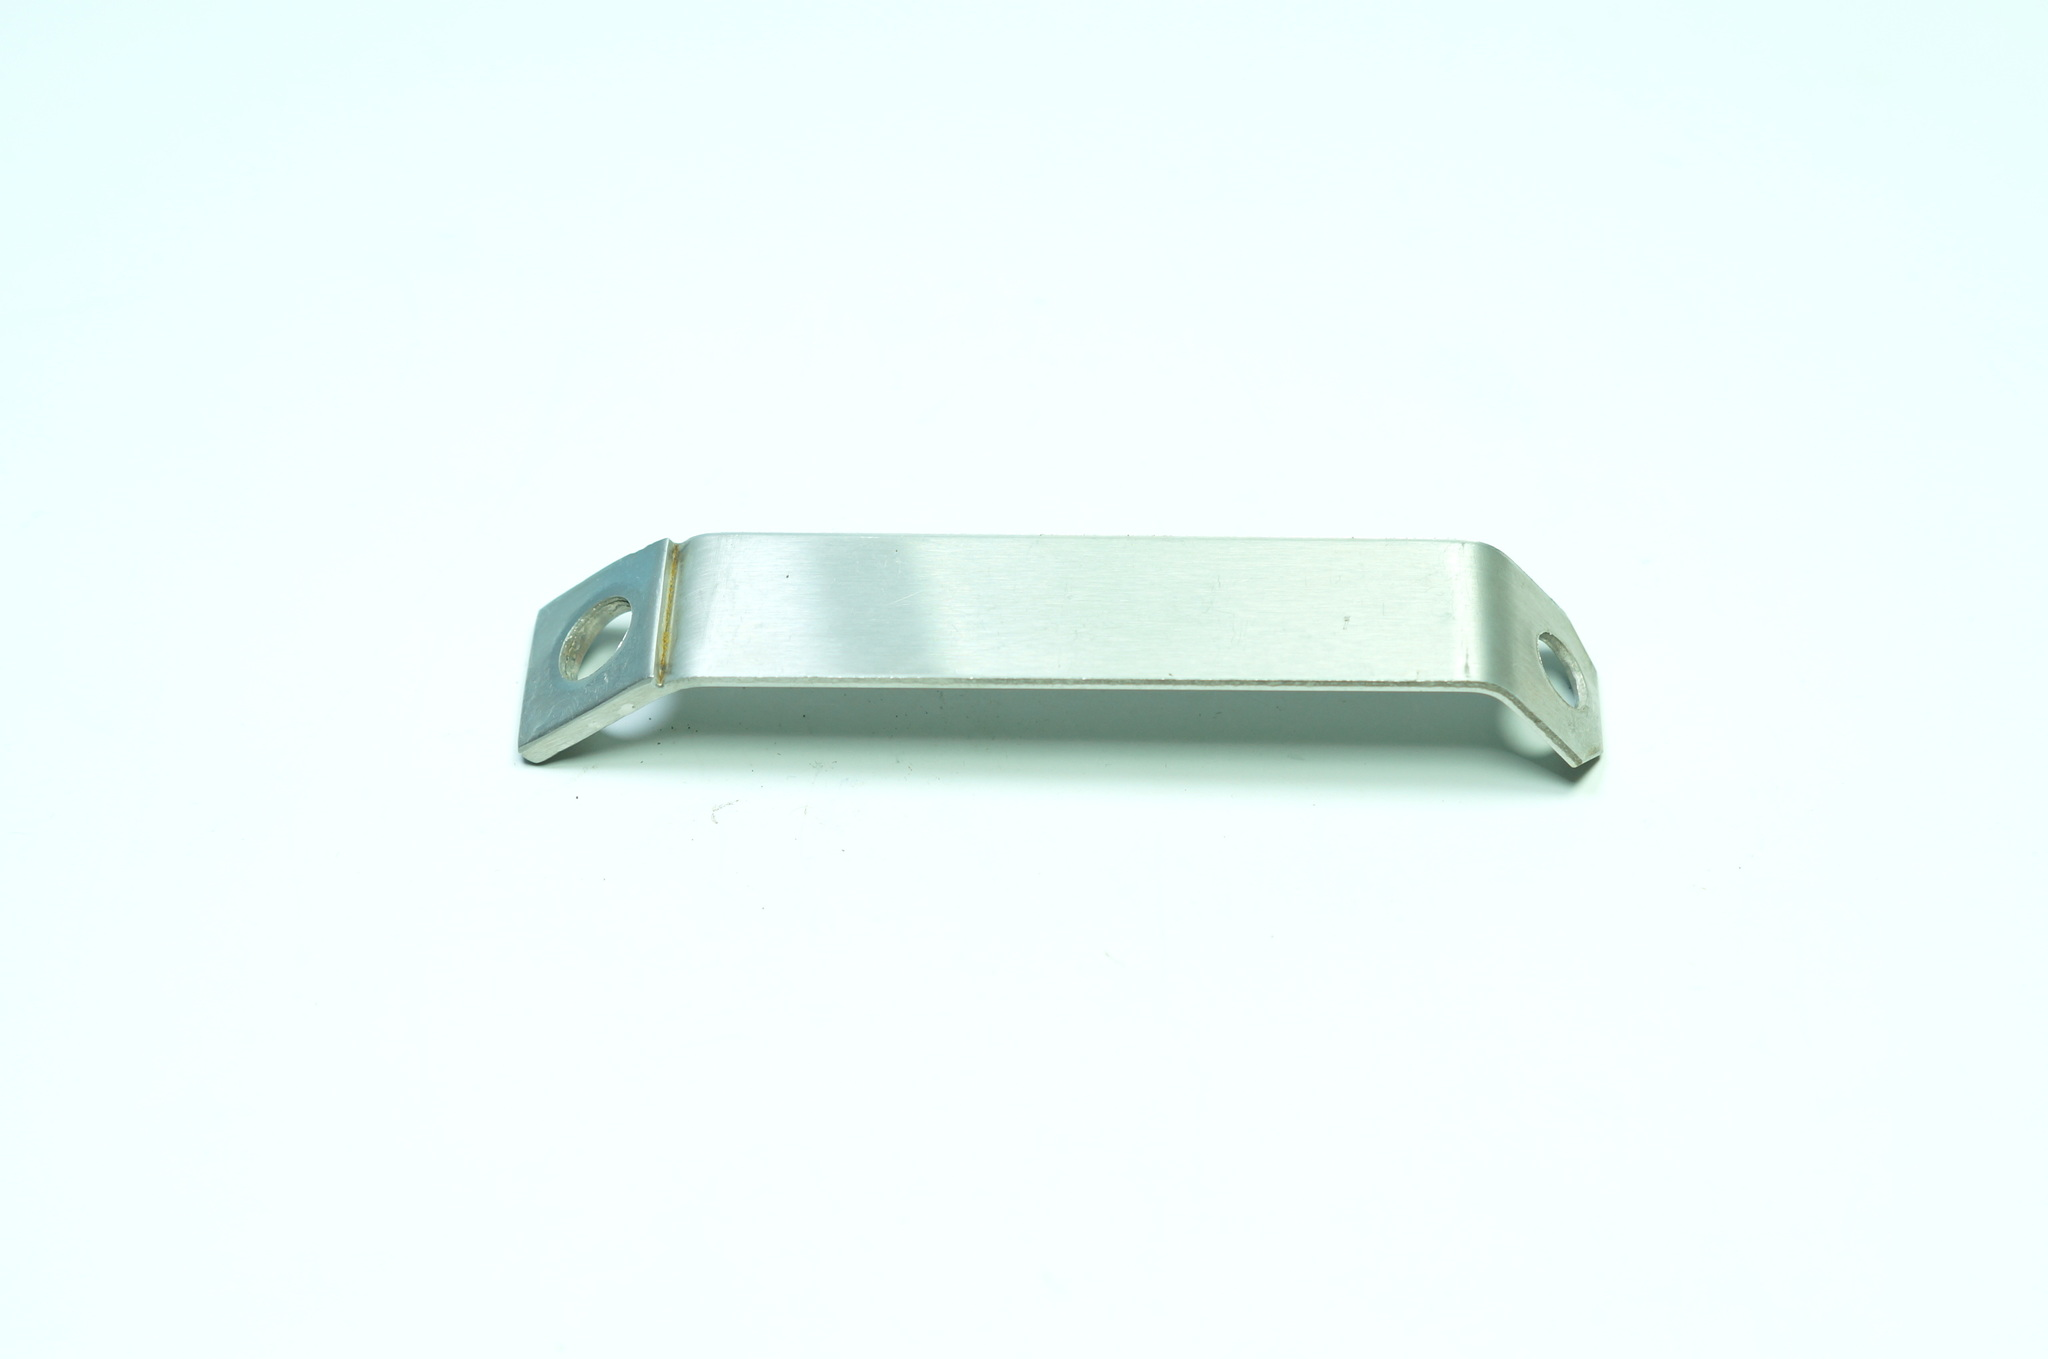 Кронштейн воздушного фильтра Газ 21